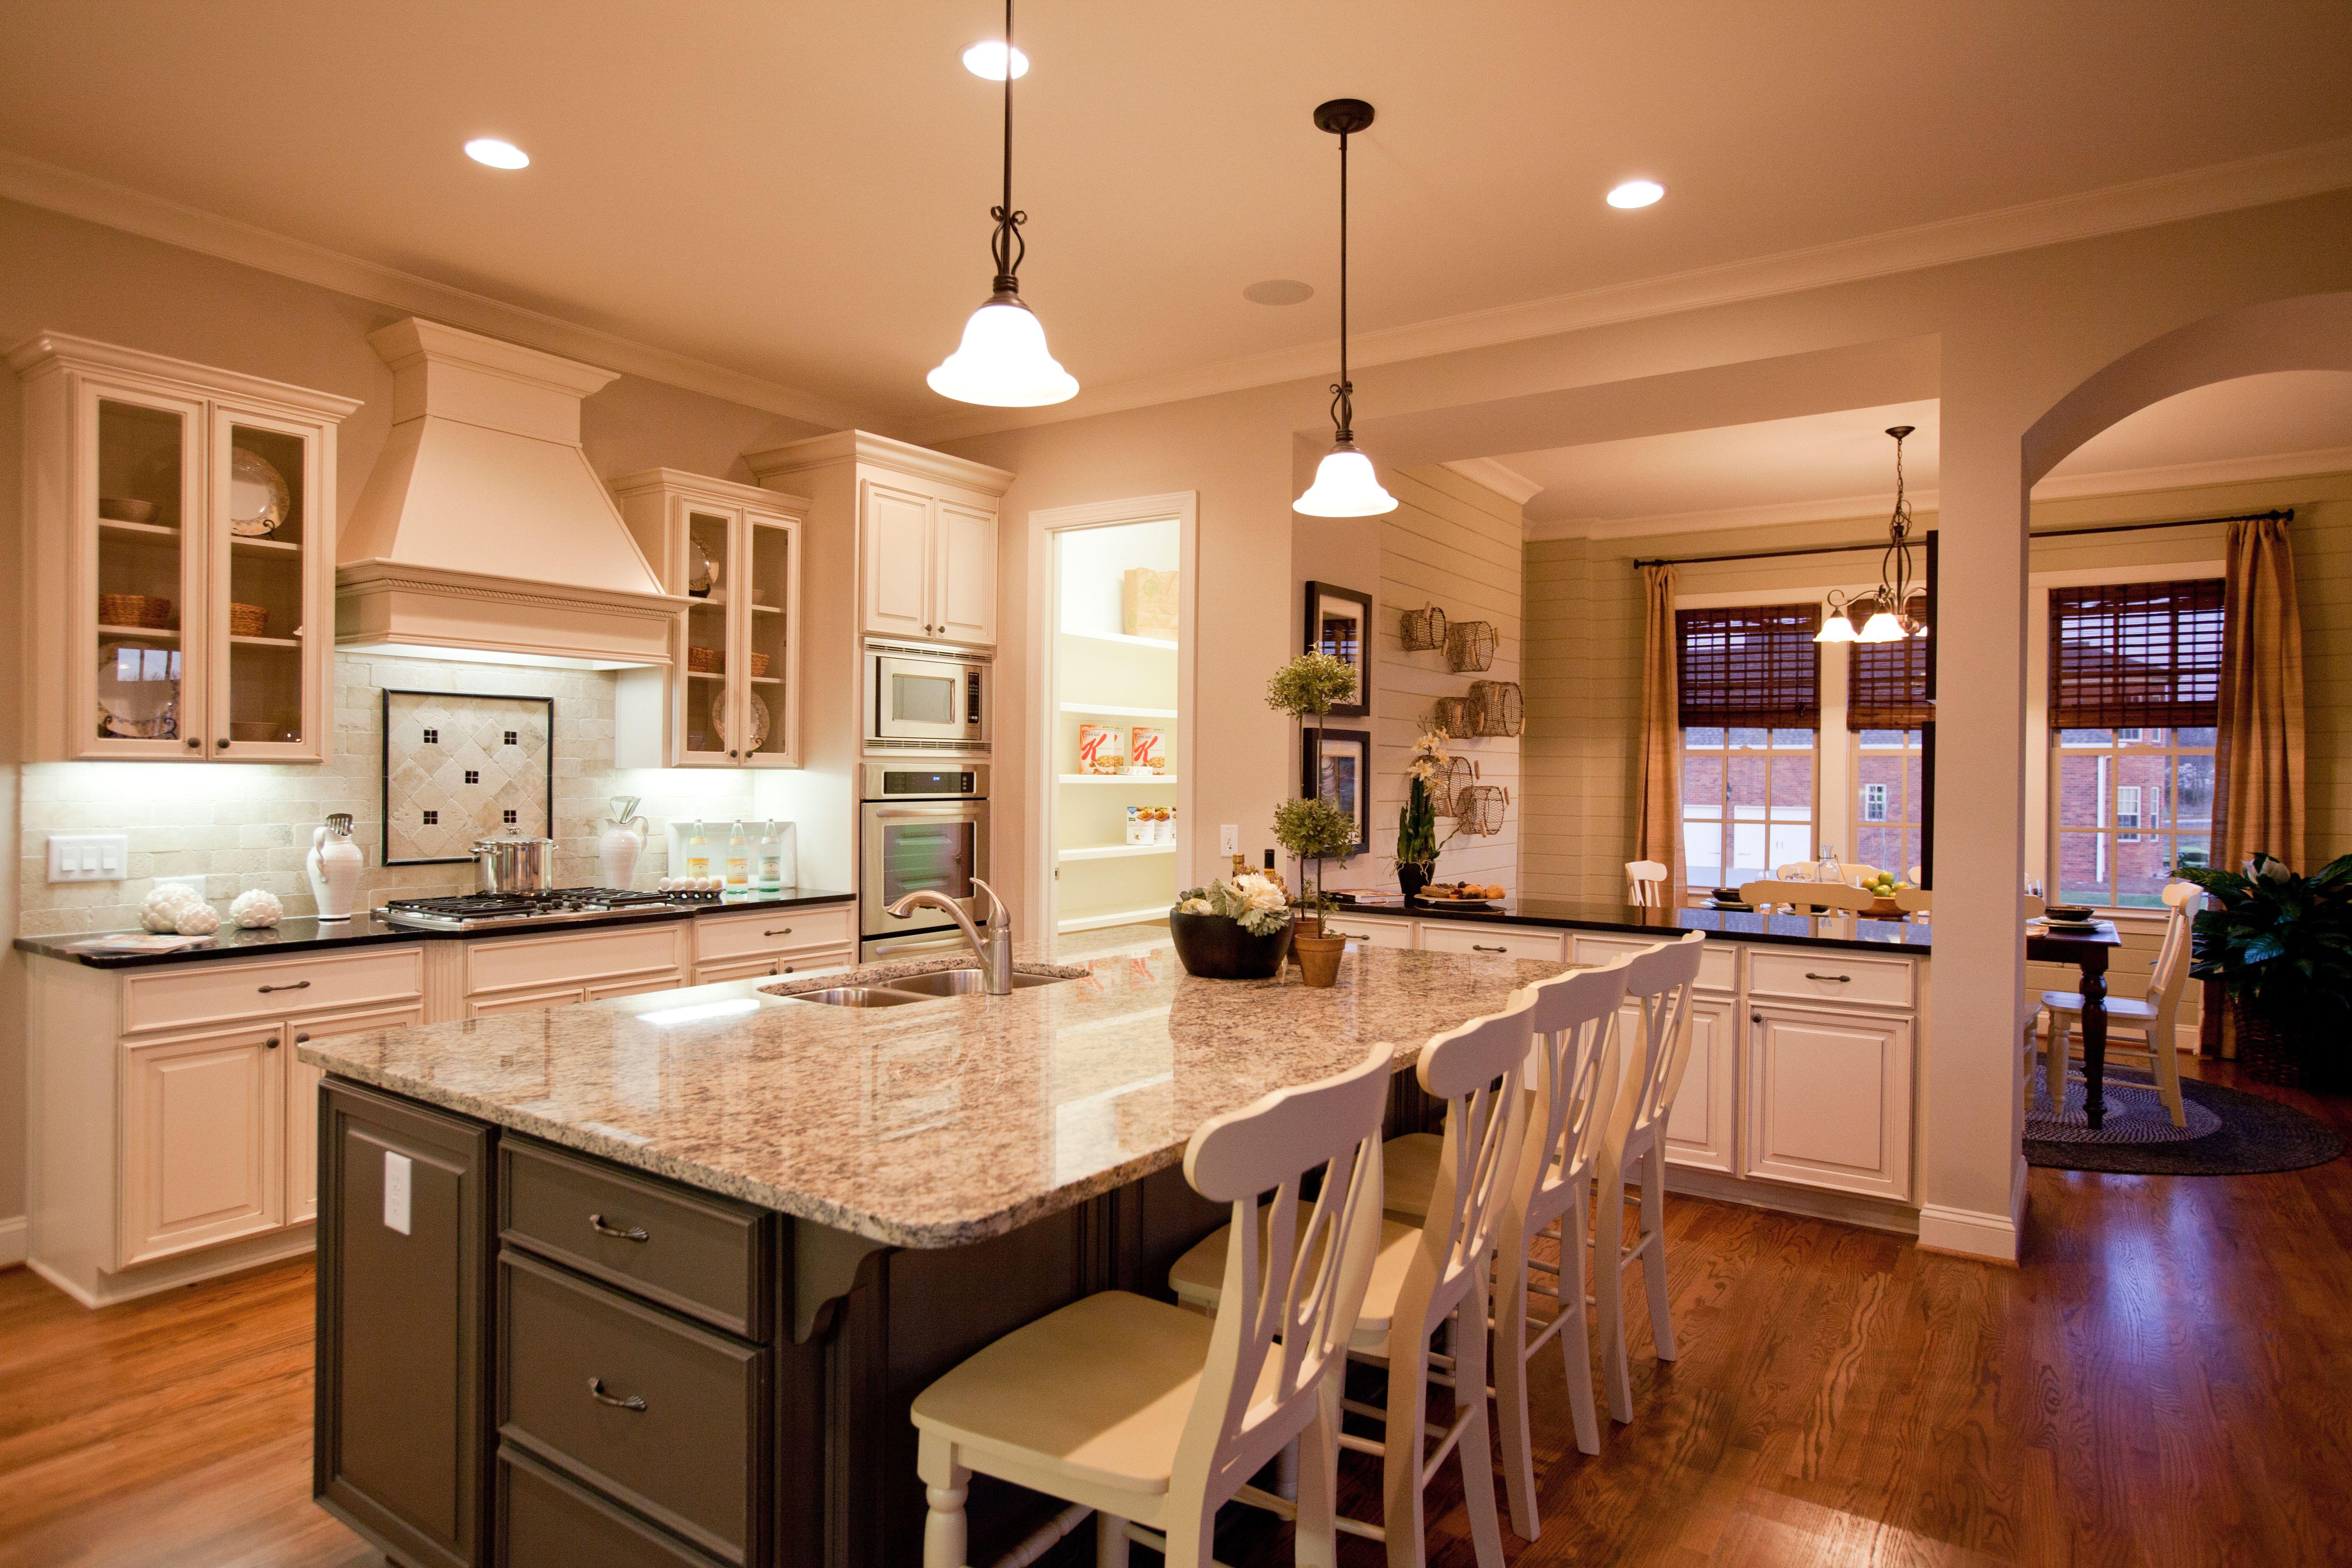 Another Gorgeous Kitchen Model Kitchen Design Kitchen Models Home Decor Kitchen